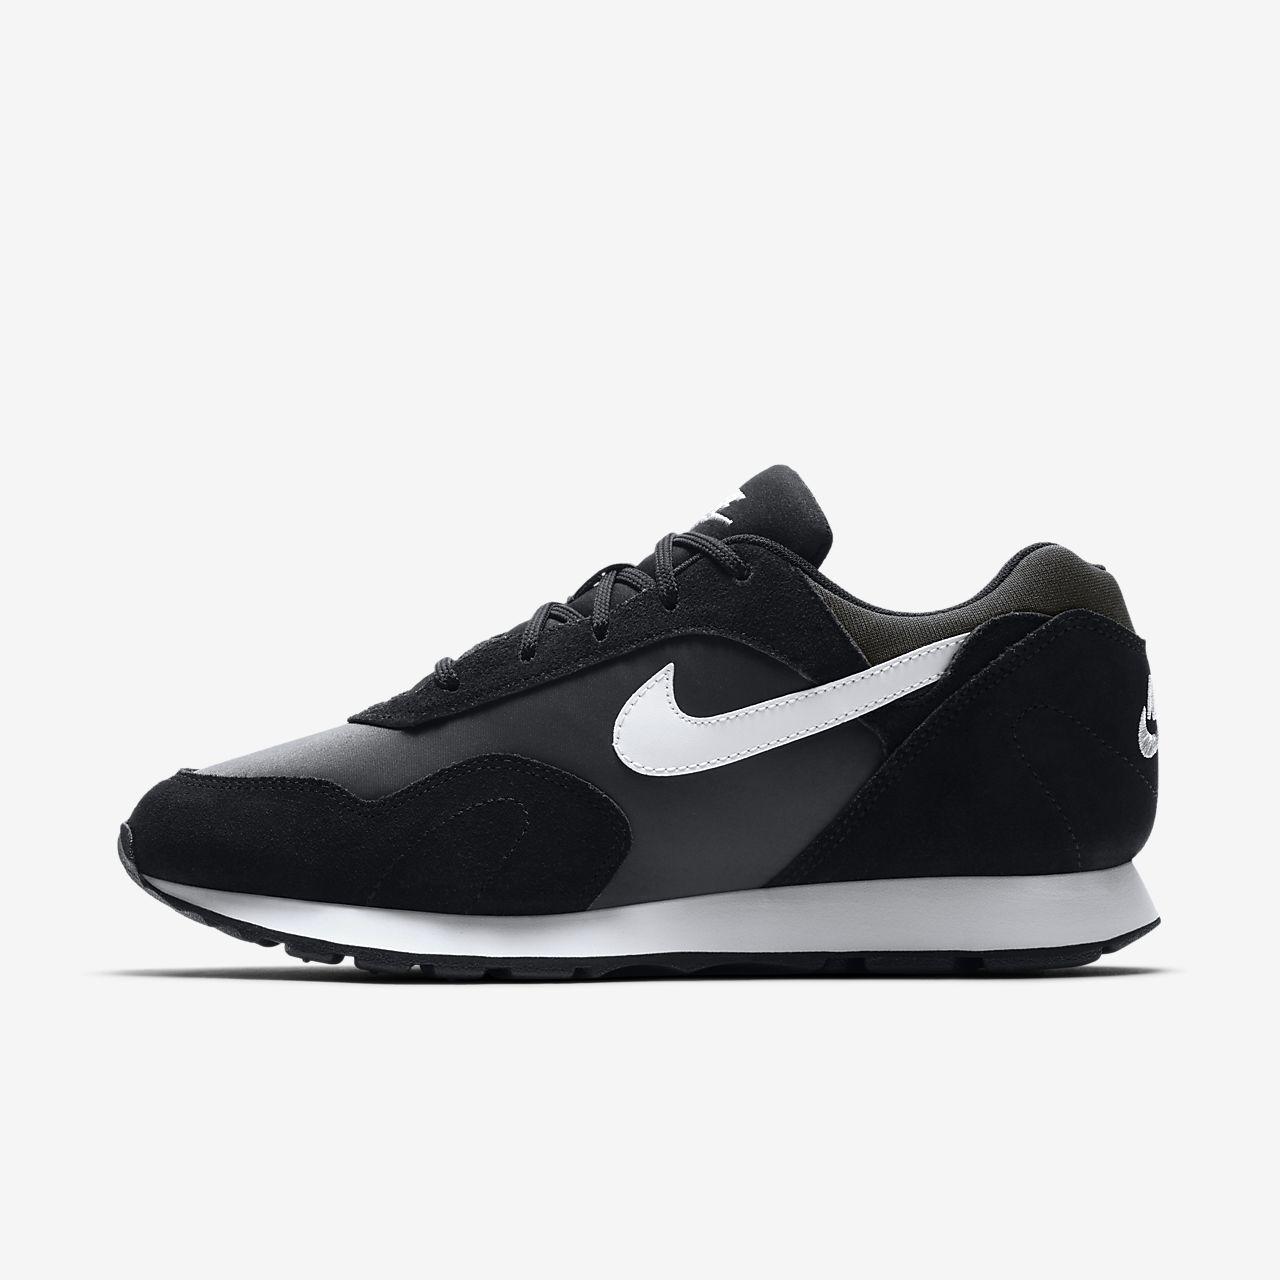 Nike Outburst Damesschoen